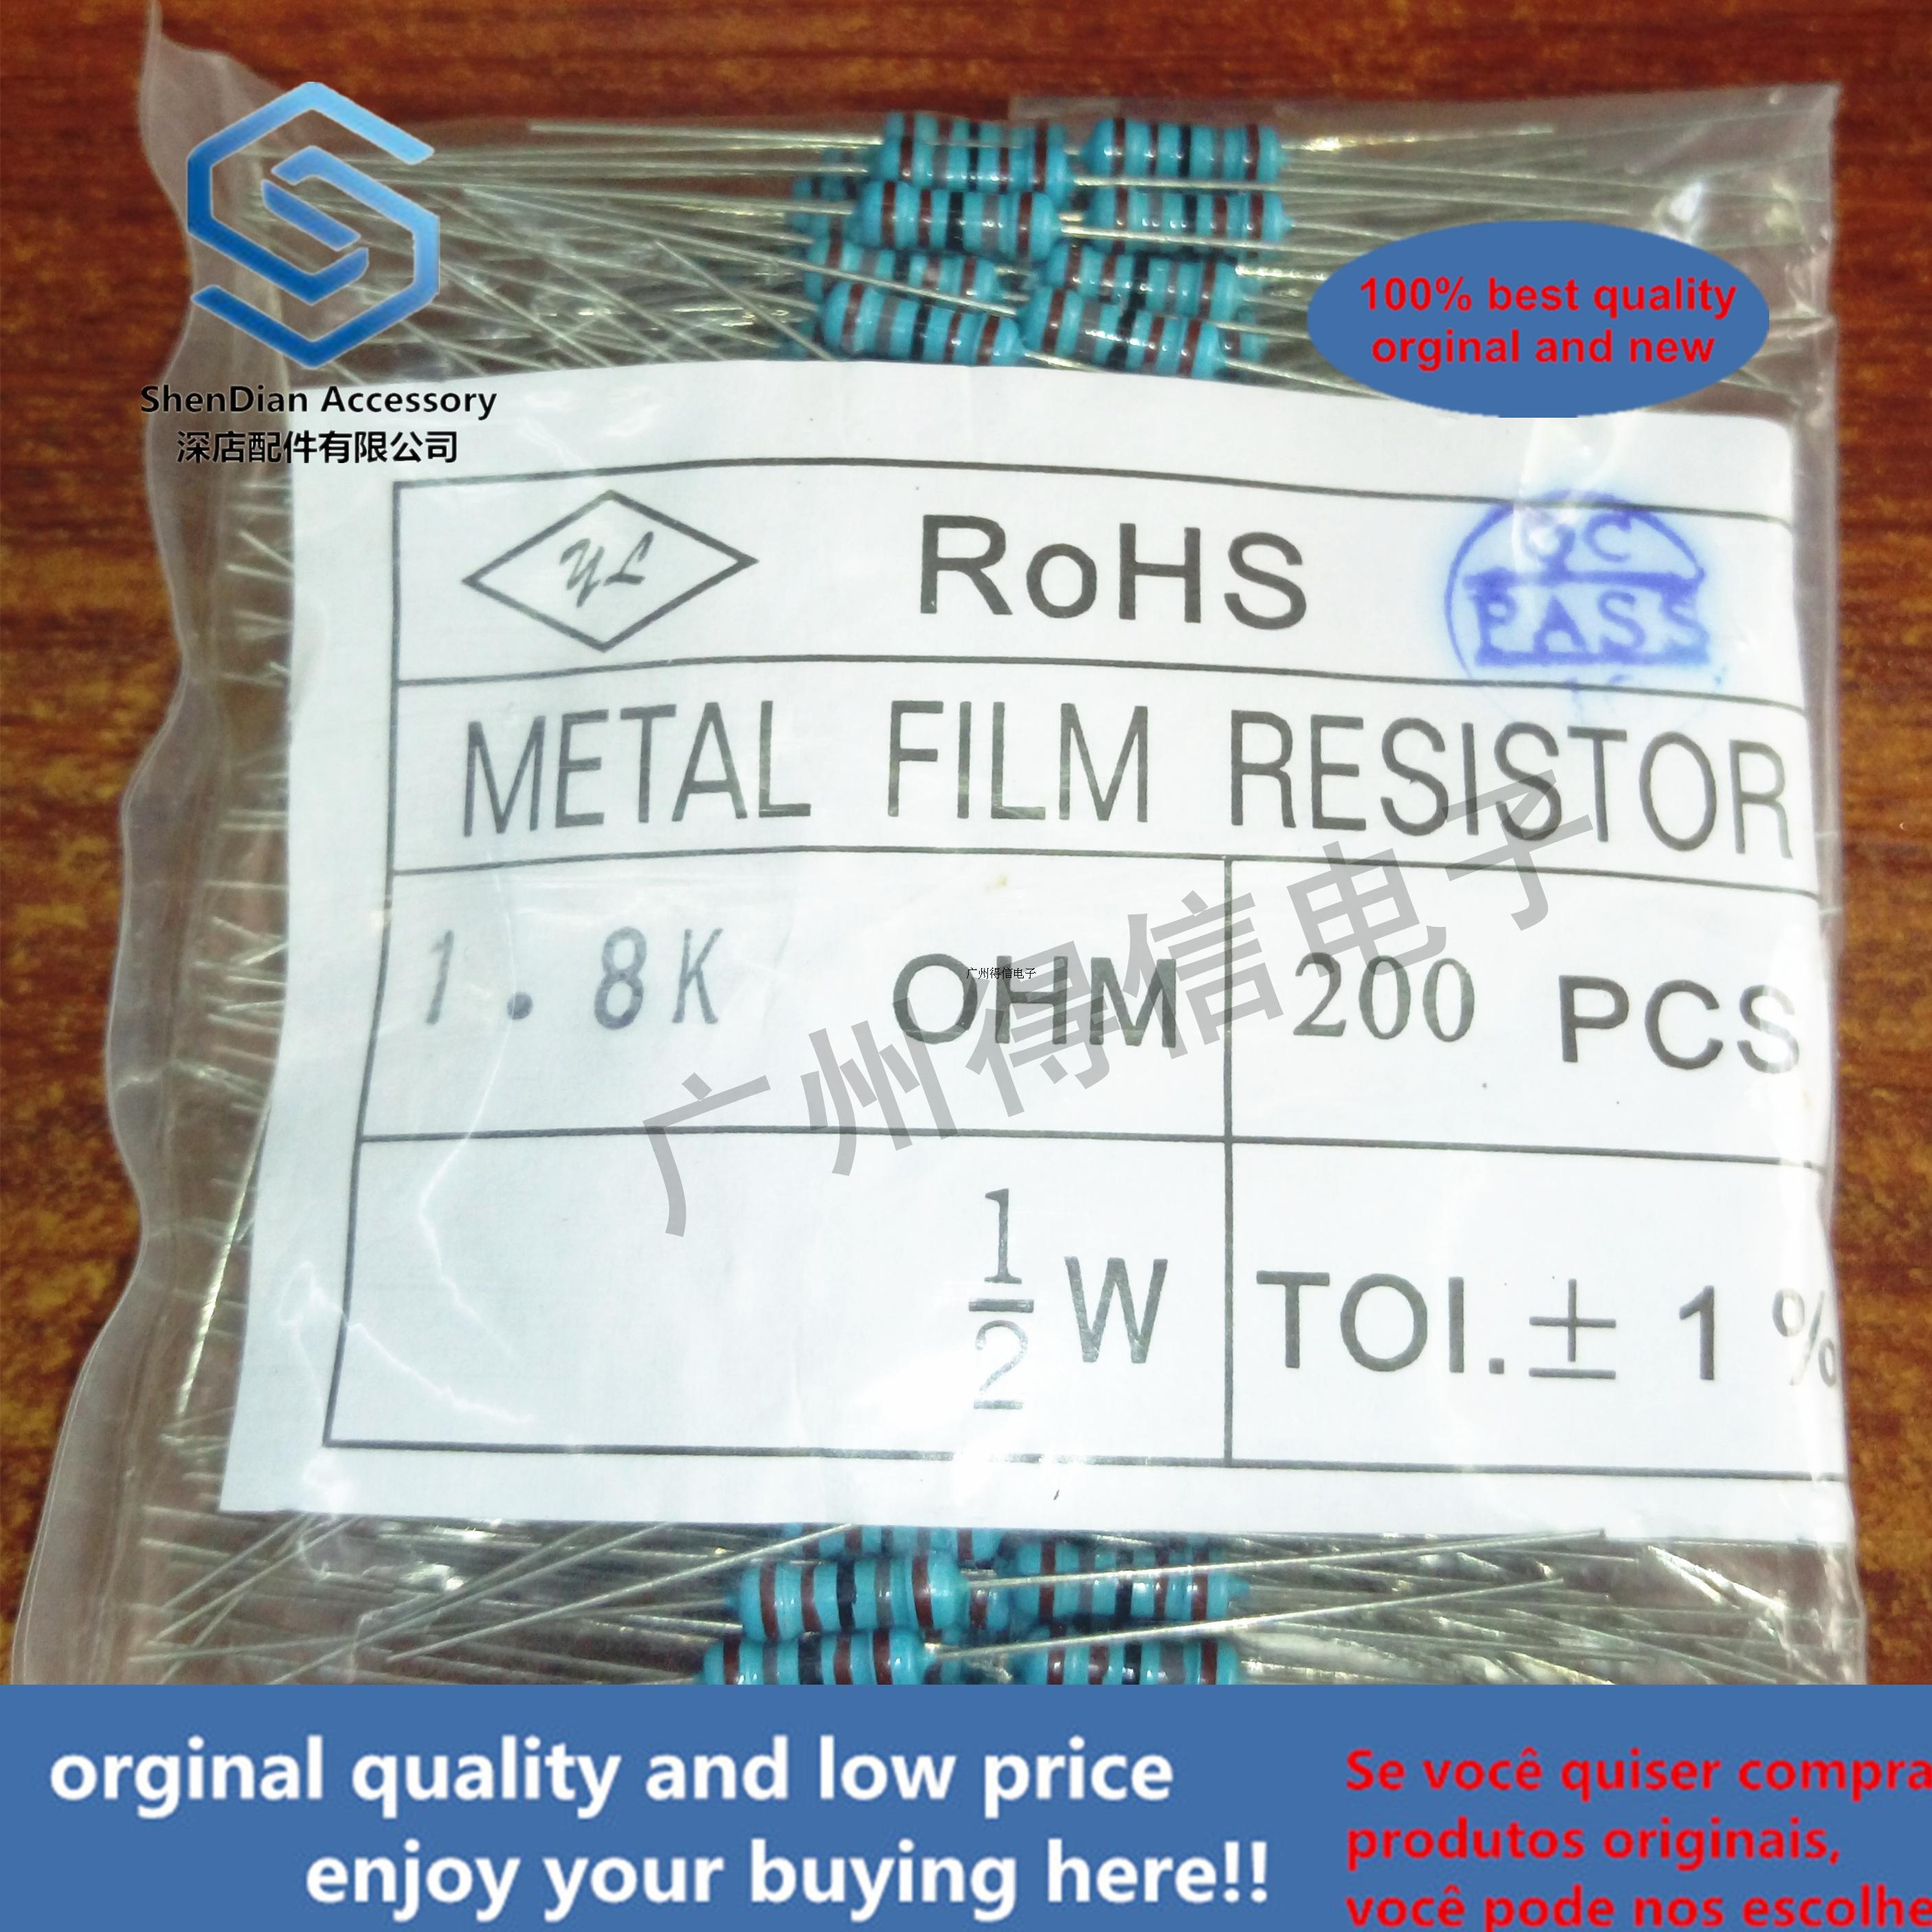 200pcs 1 / 2W 300K 1% Brand New Metal Film Iron Feet Resistor Bag 200 Pcs